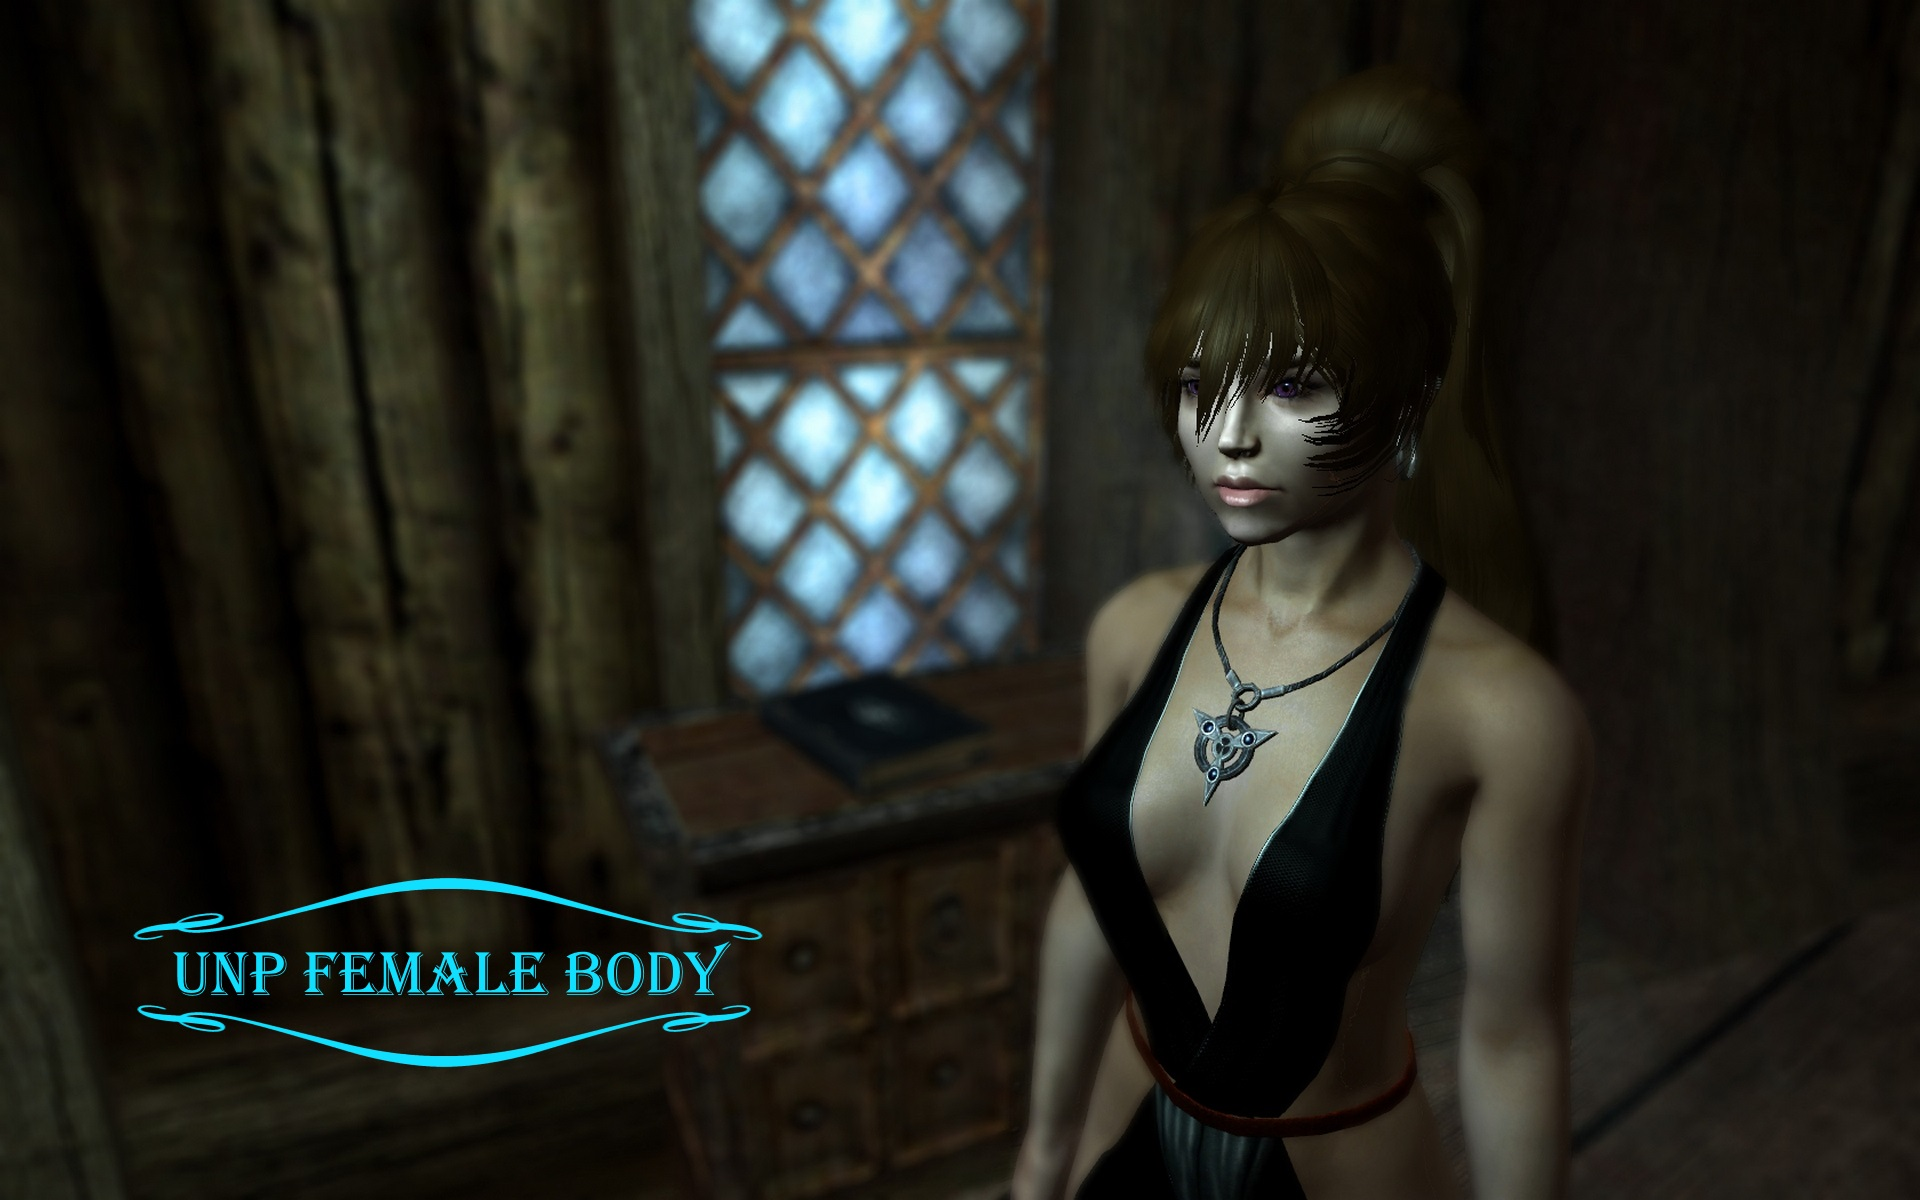 UNP_female_body.jpg